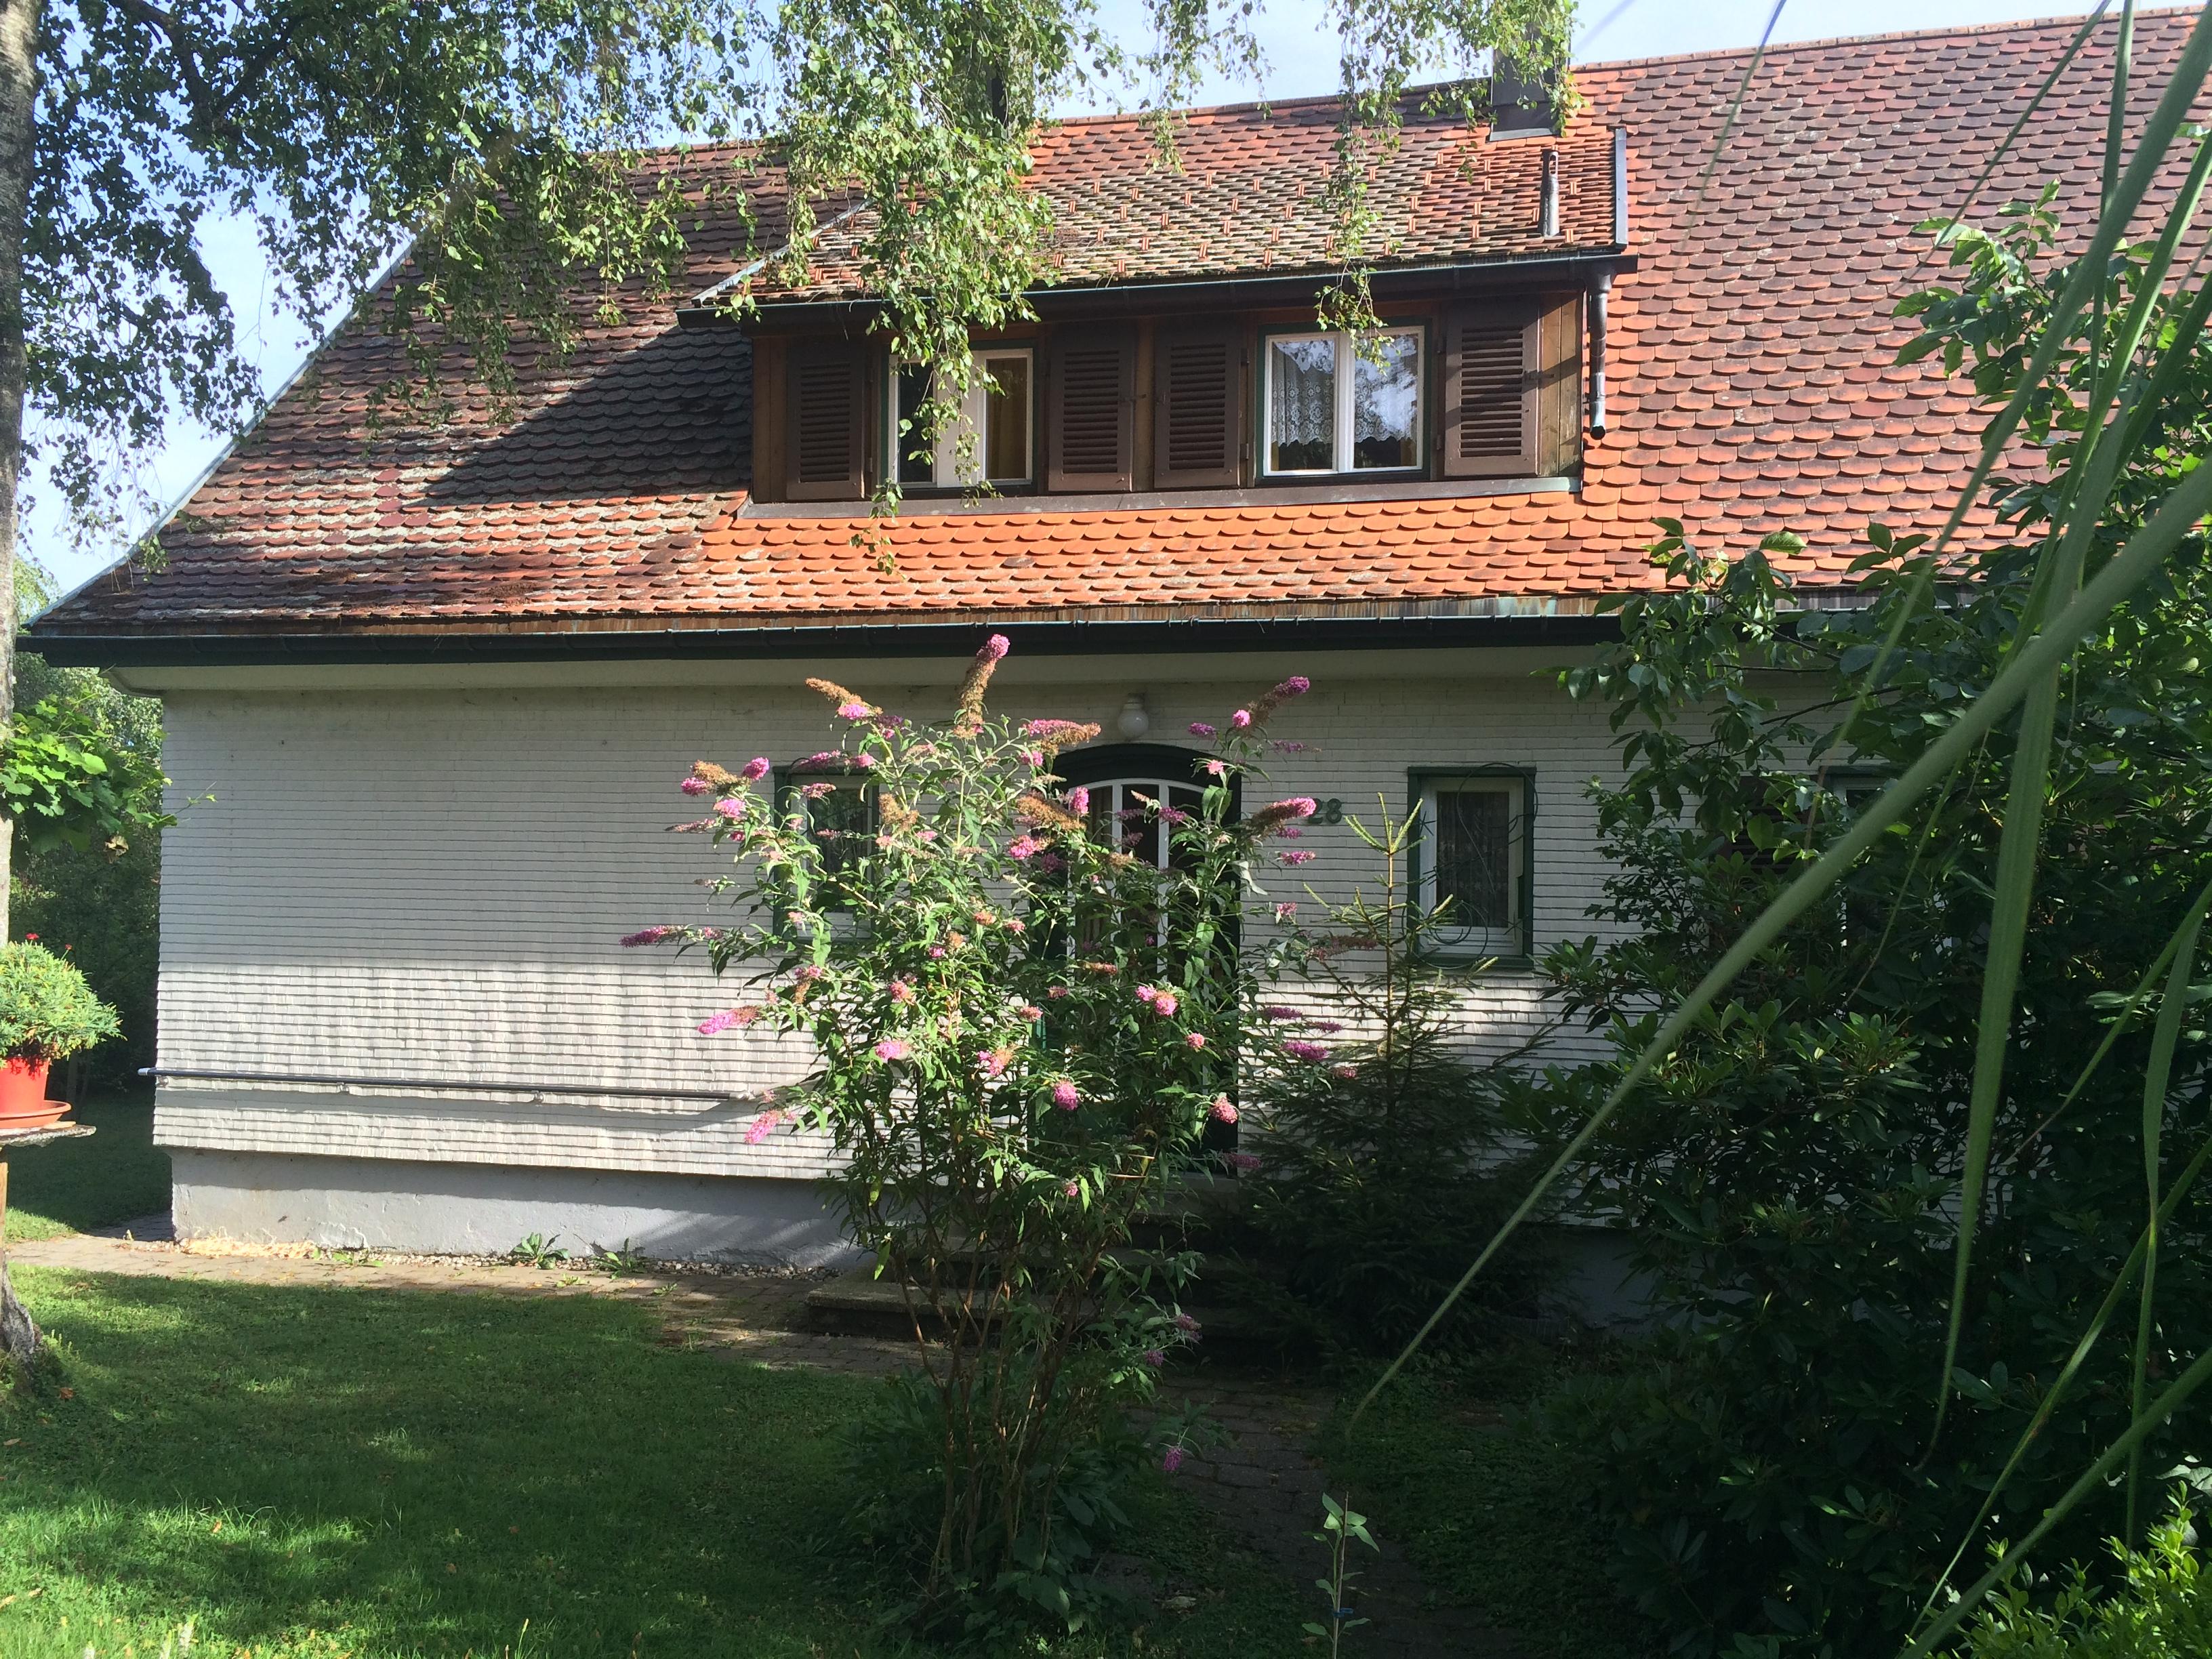 Haus Sonnenhalde,Hauseingangsseite